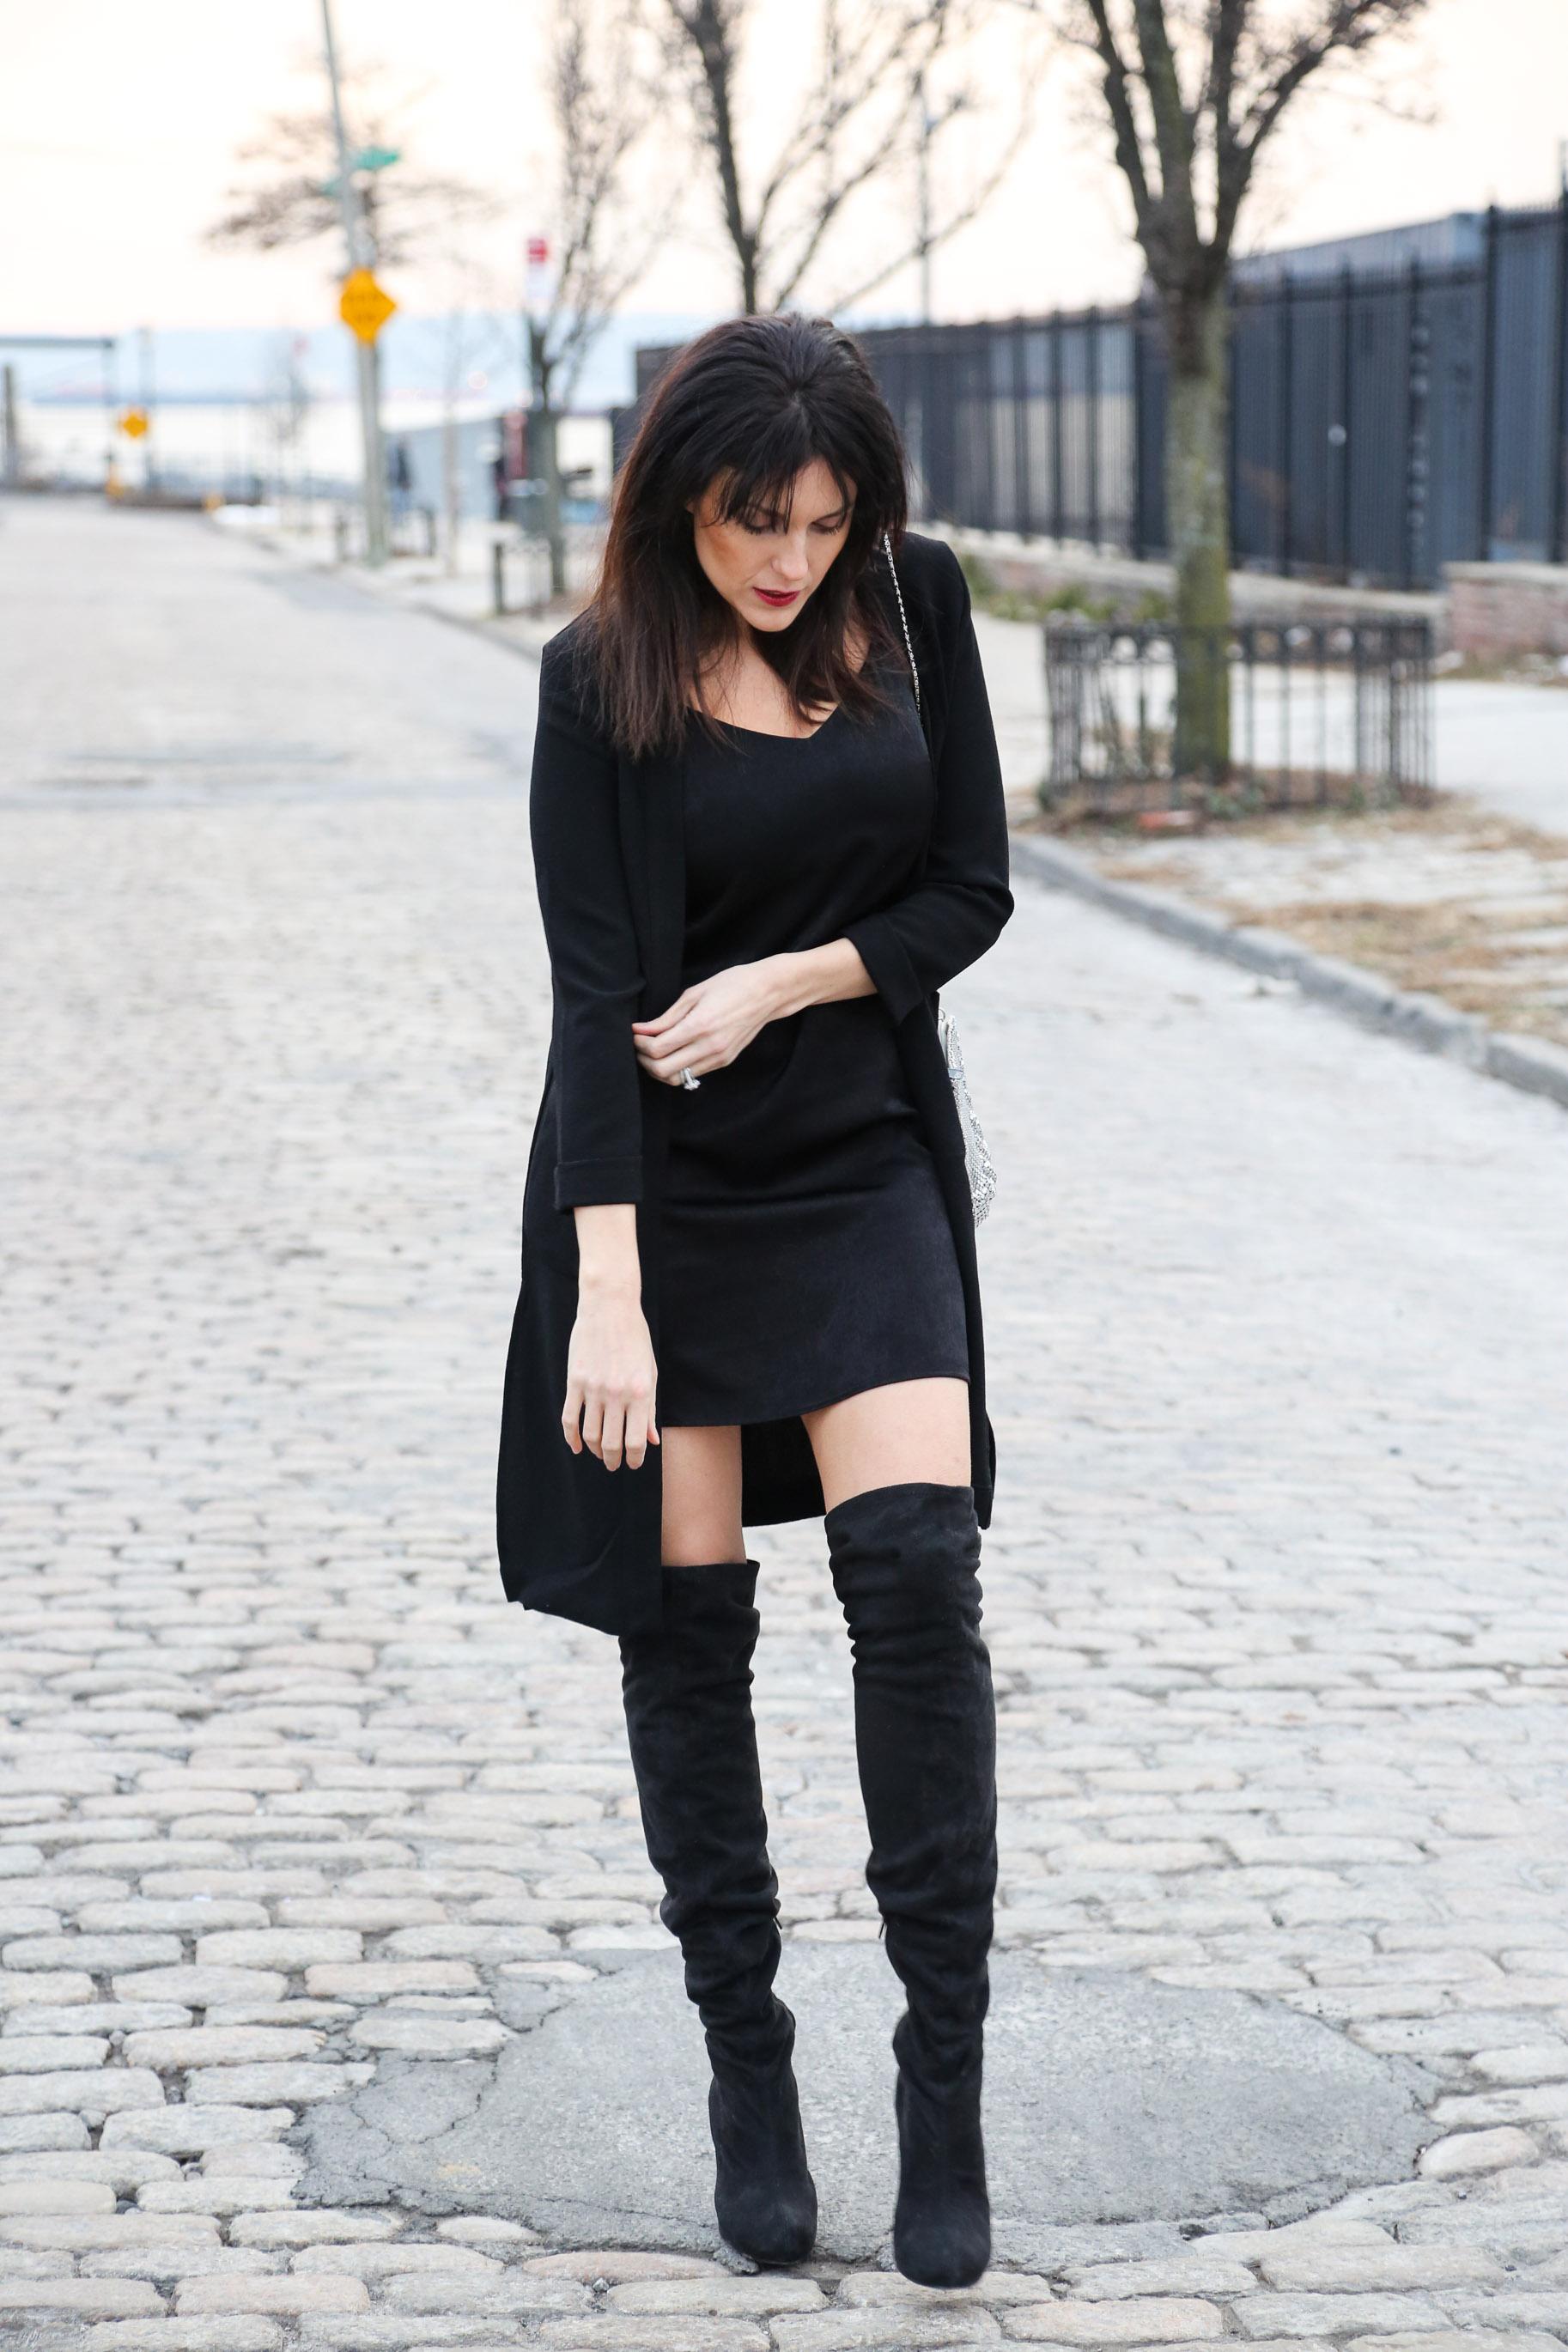 nye-outfit-idea-8.jpg